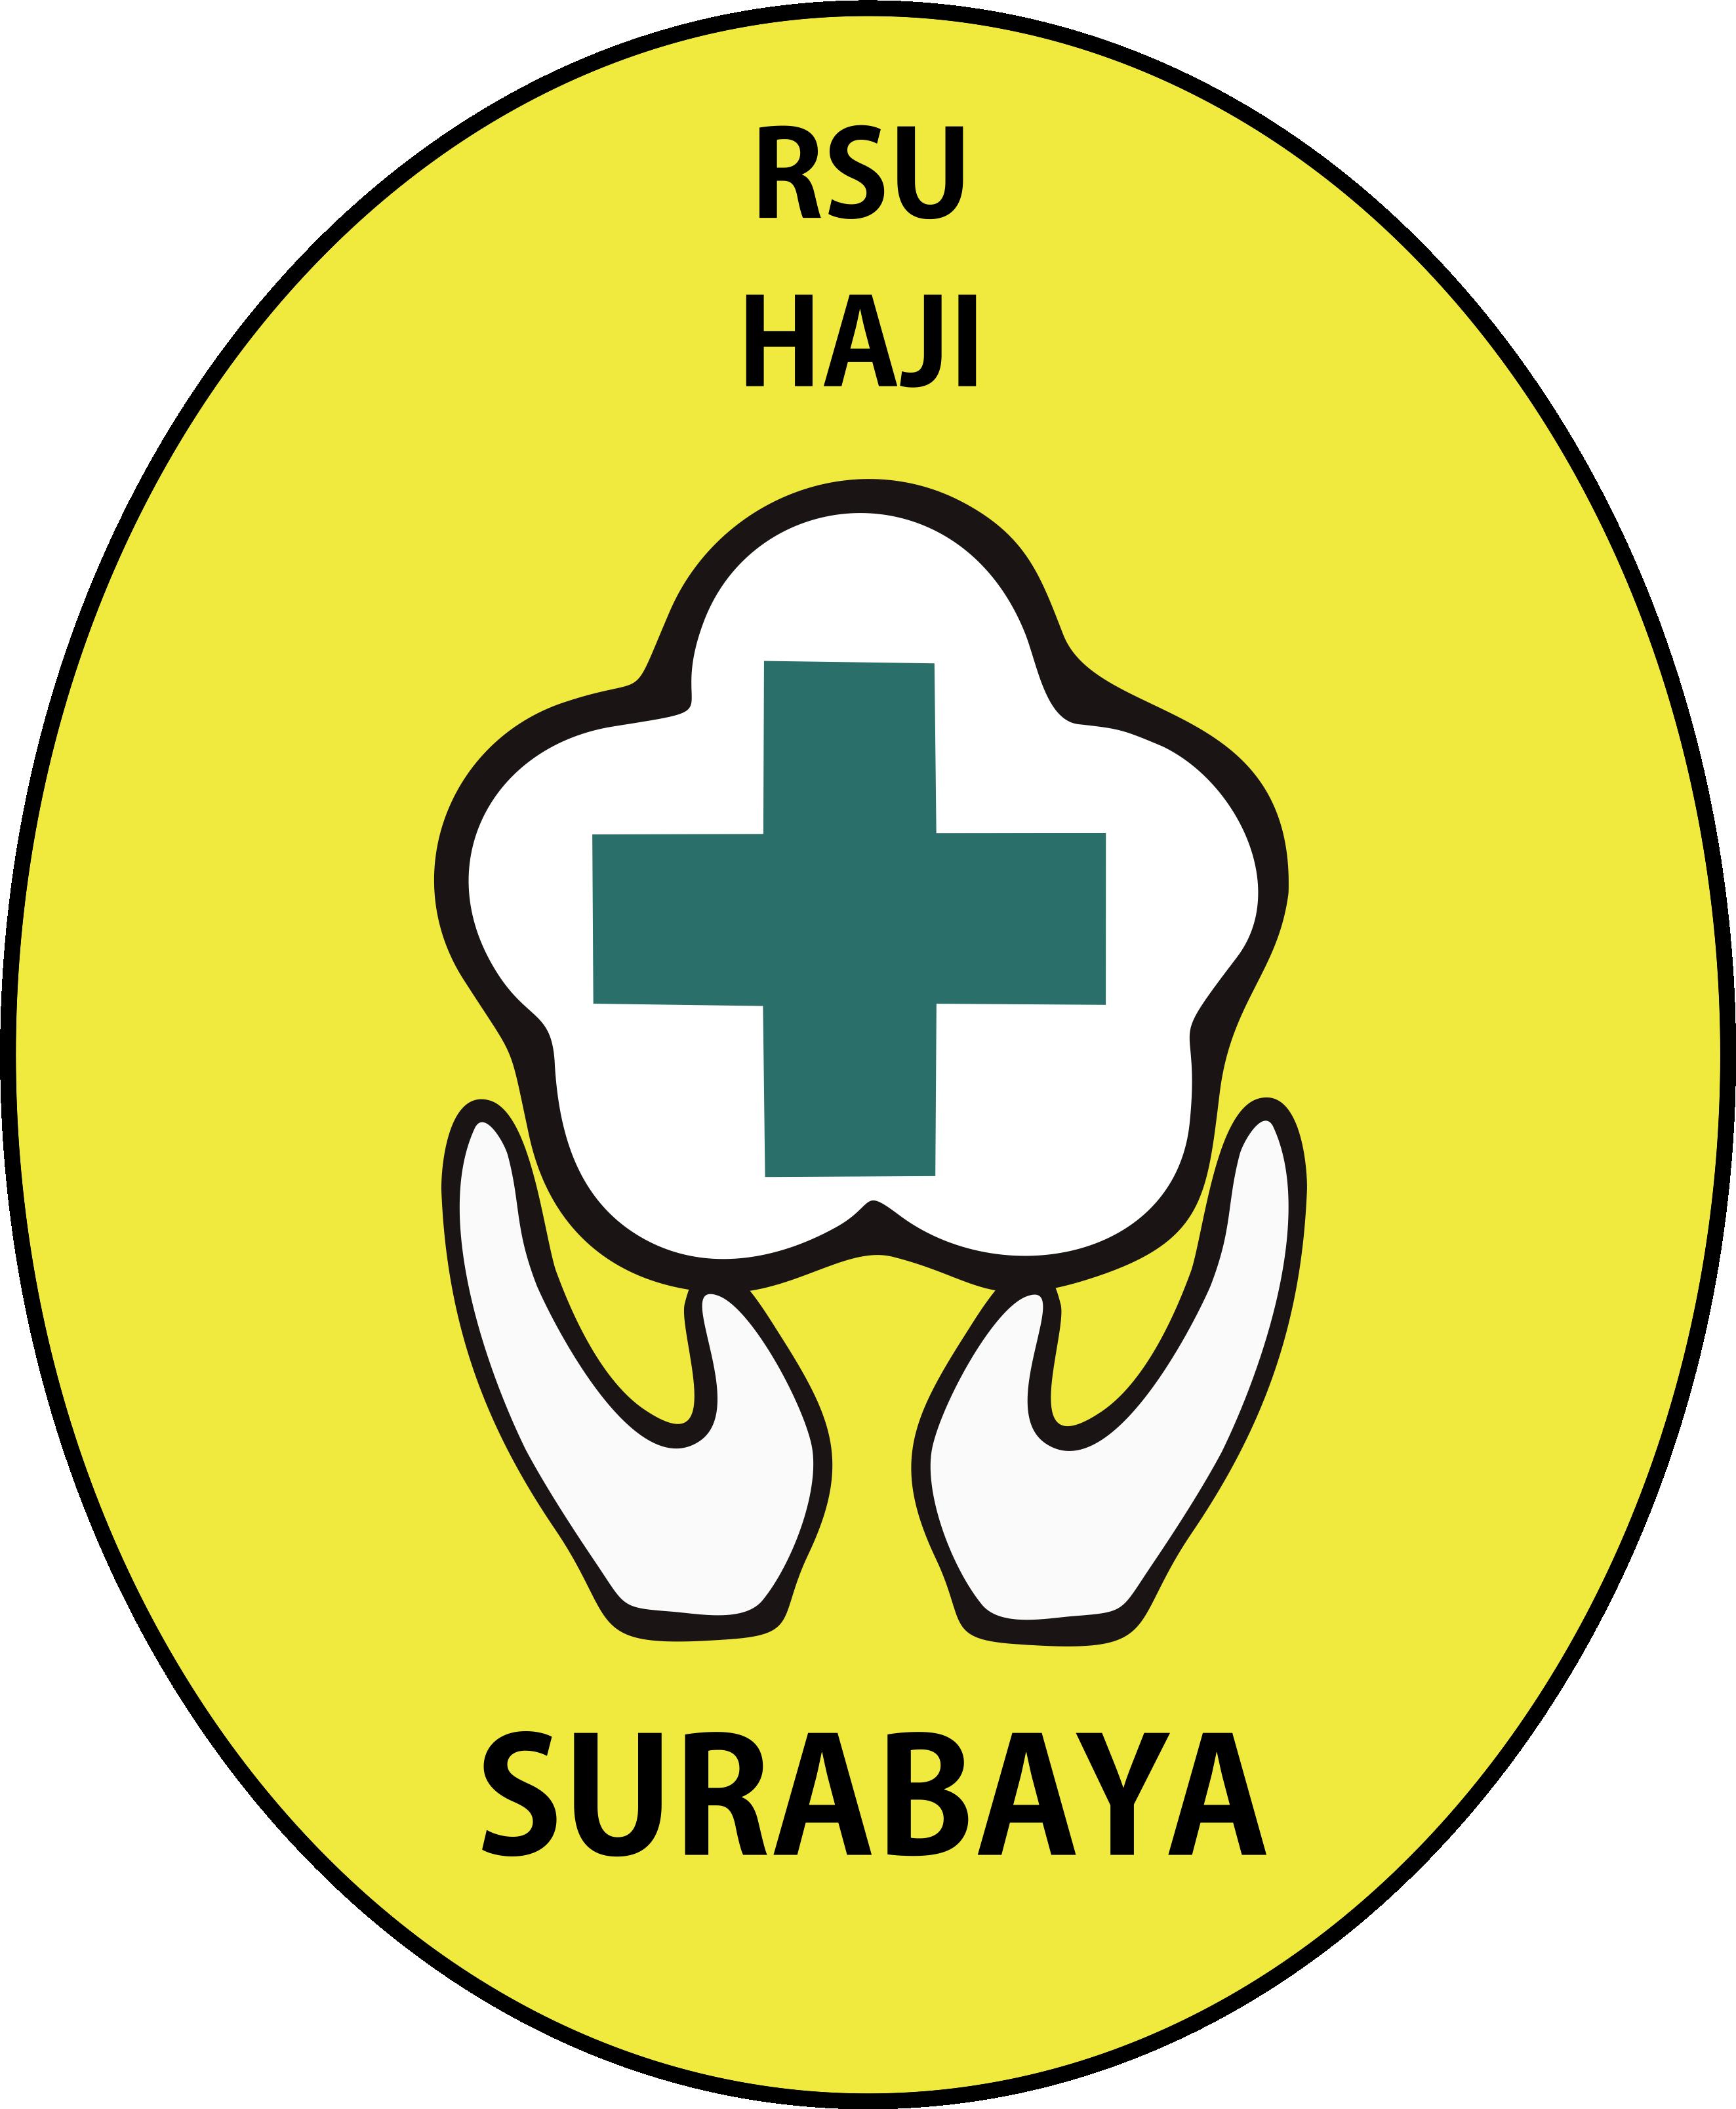 RS Haji Surabaya